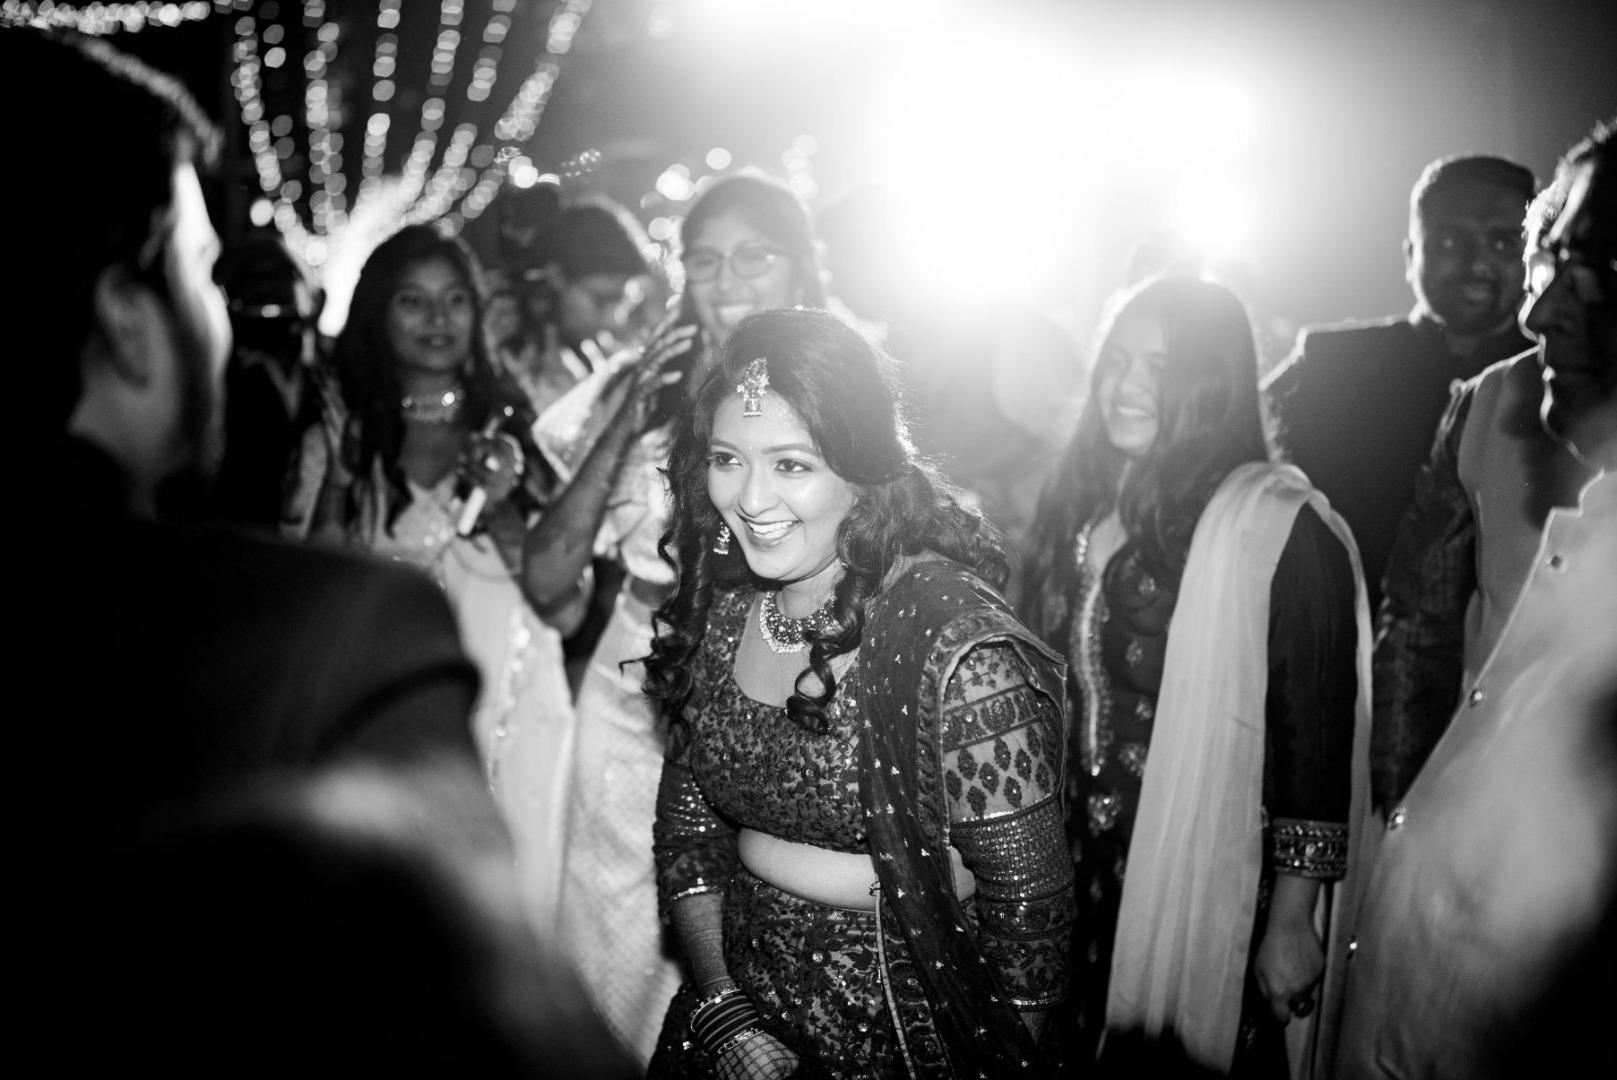 Black & White Picture of Bride Dancing